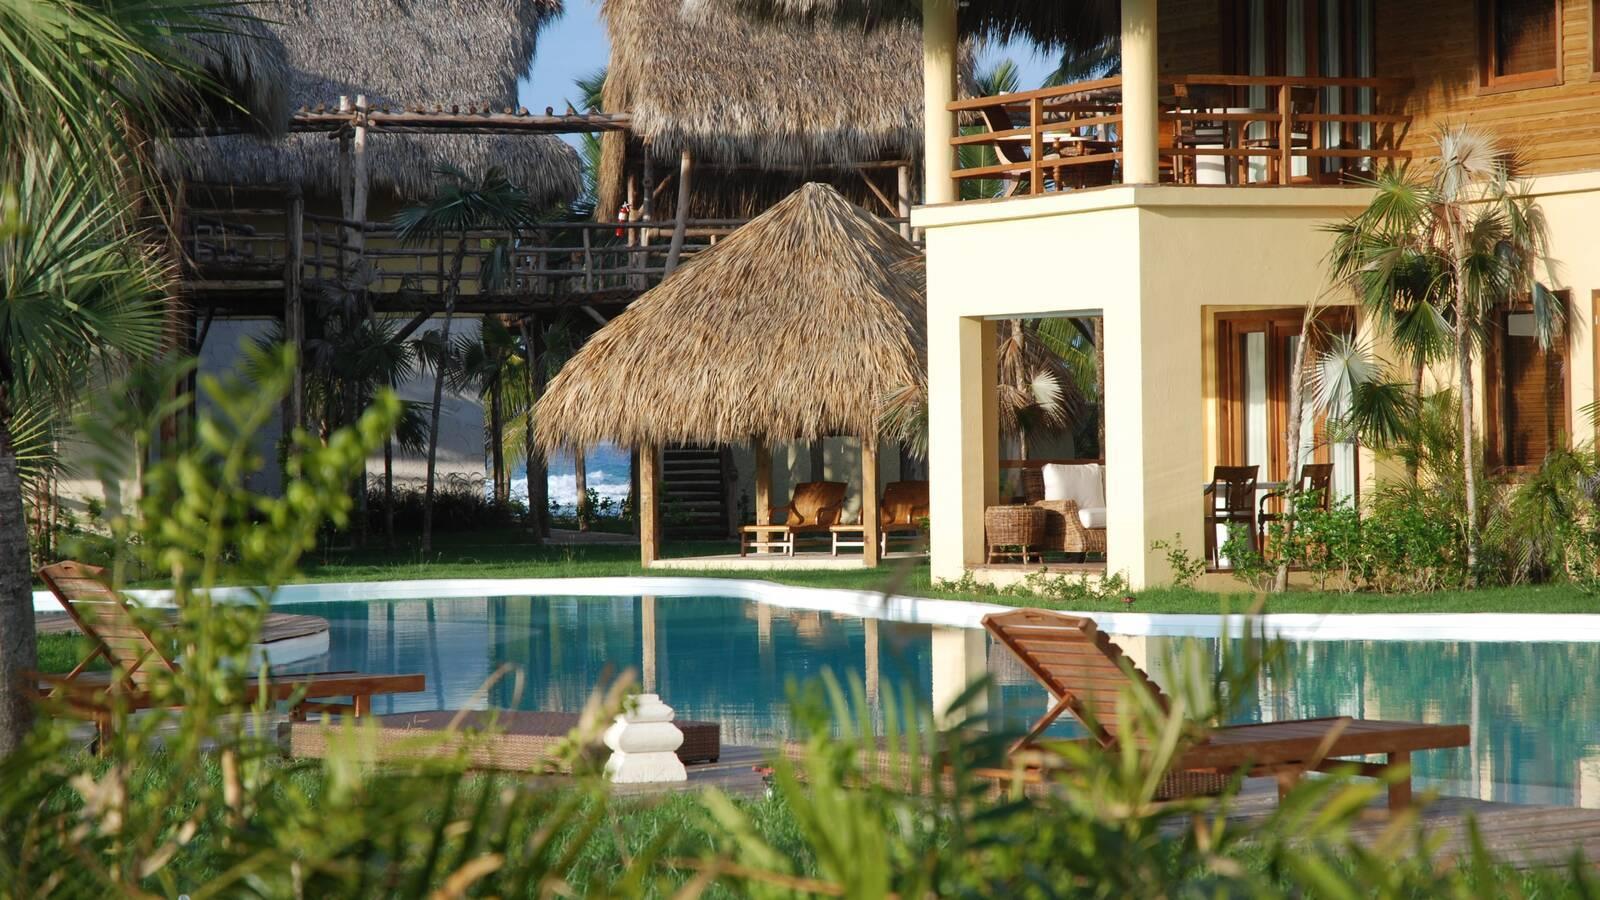 Zoetry Punta Cana Republique Dominicaine piscine et suites AMResorts